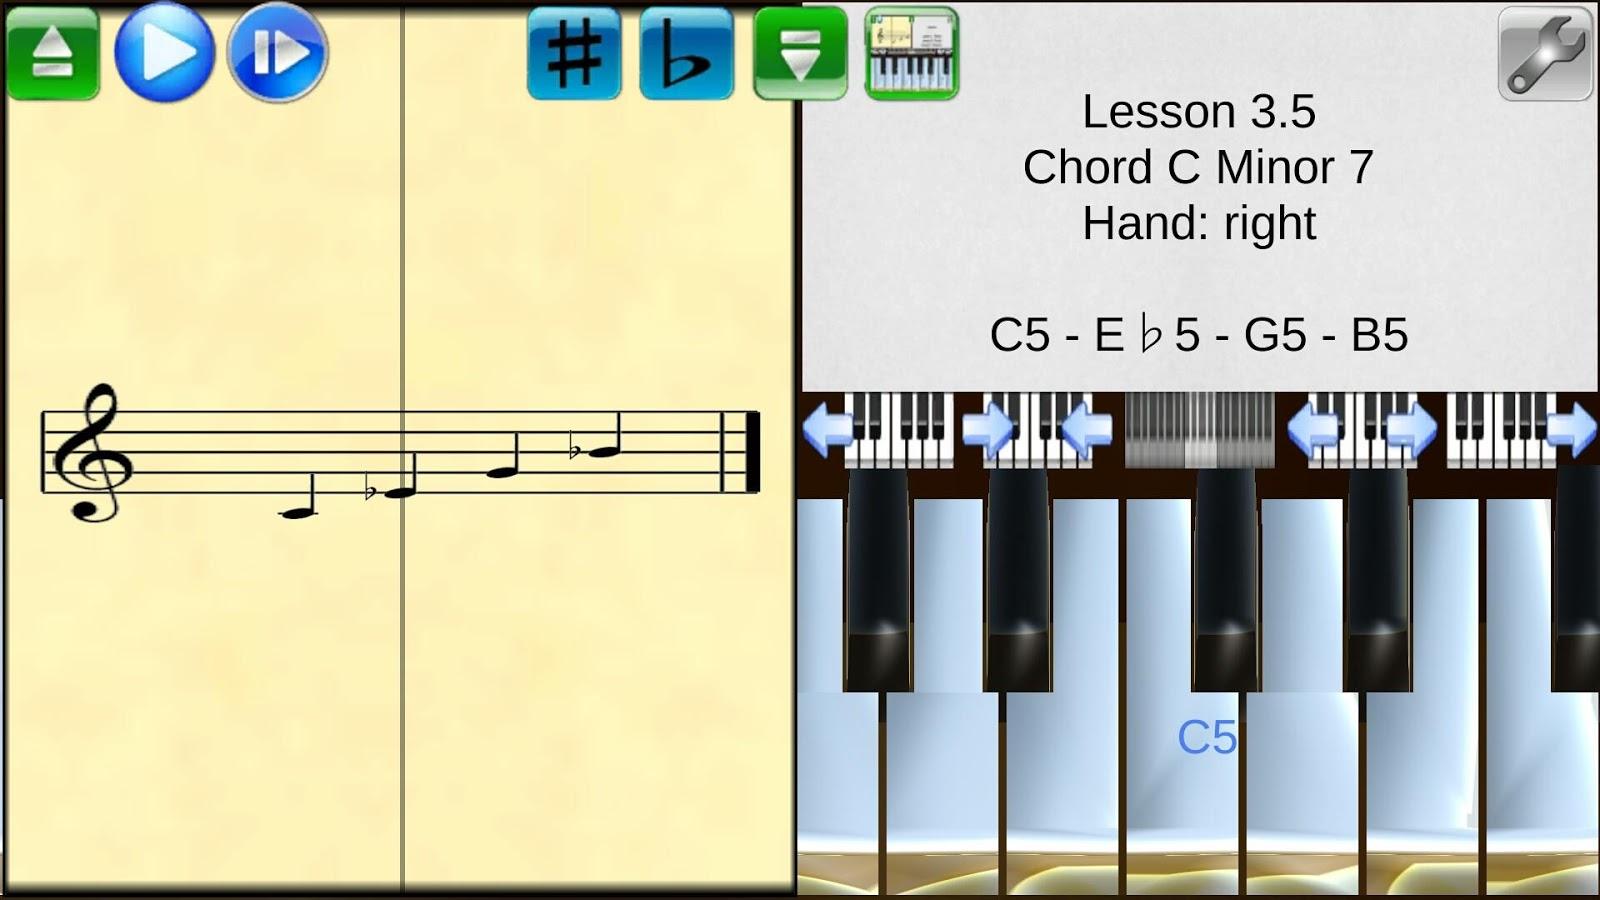 Piano studio android apps on google play piano studio screenshot hexwebz Choice Image